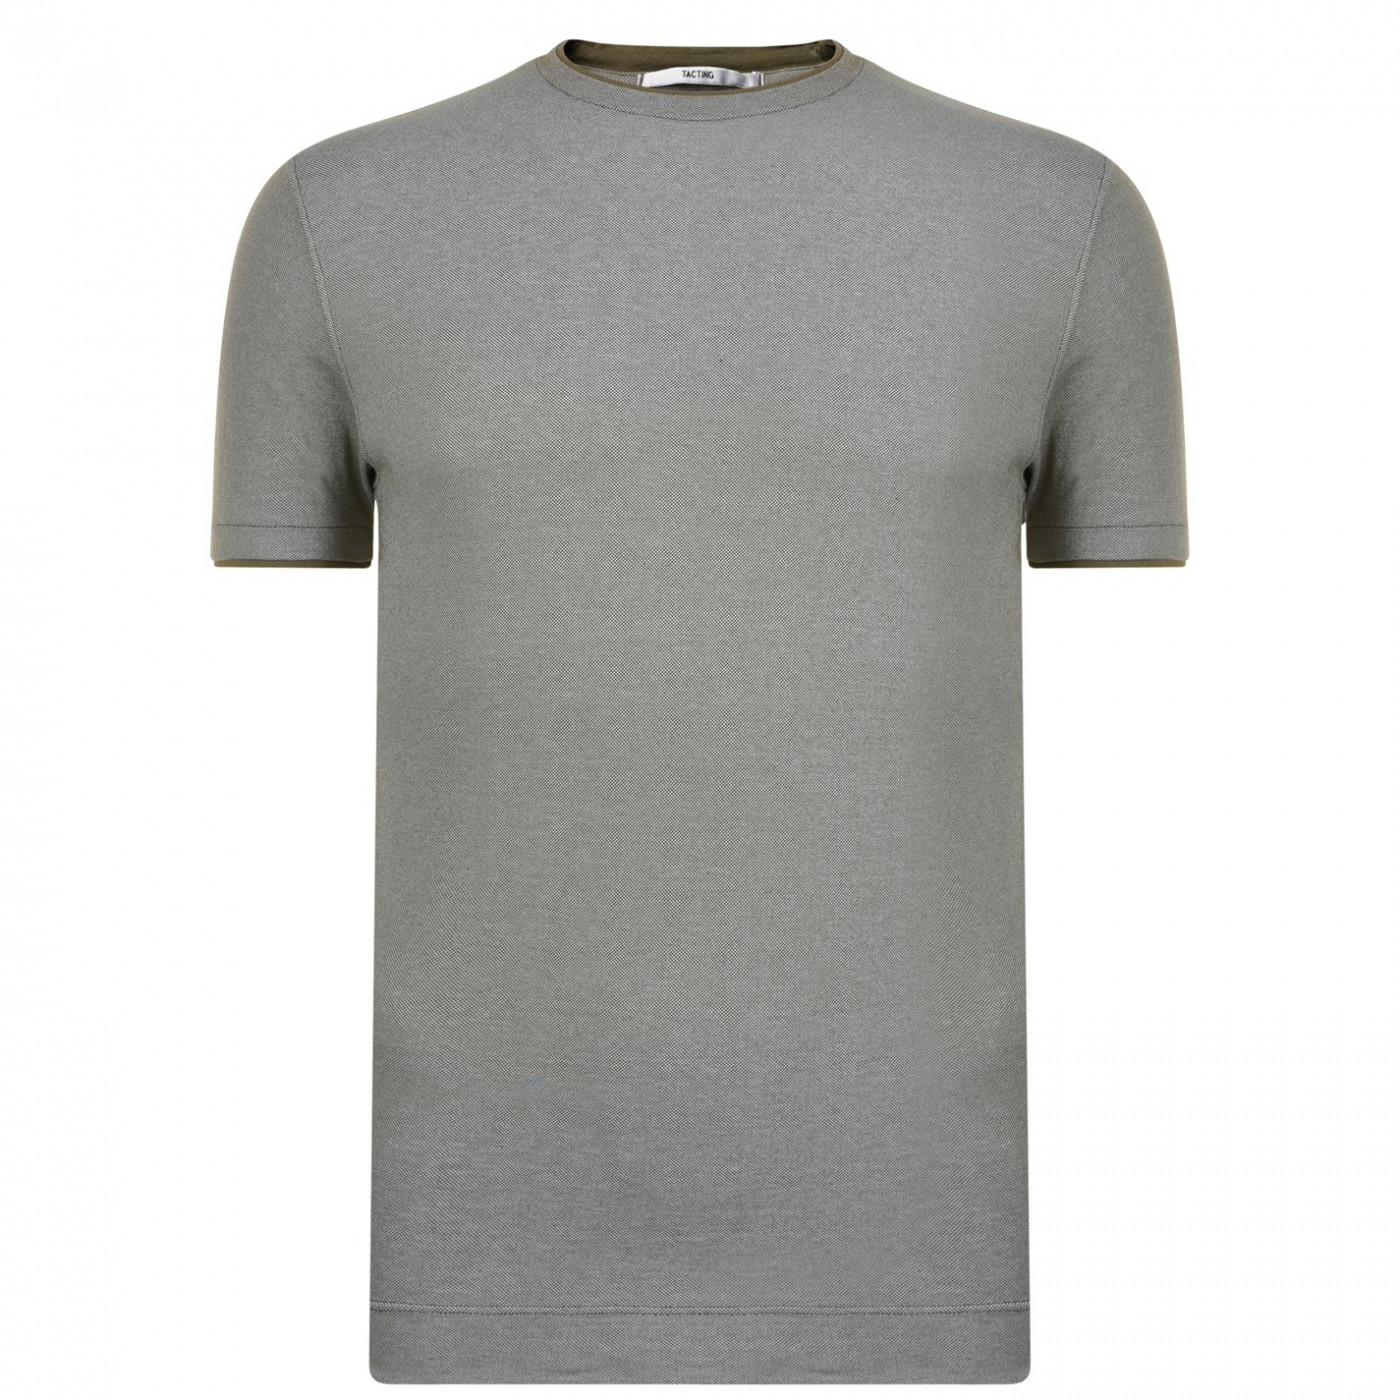 CP COMPANY Short Sleeve T Shirt